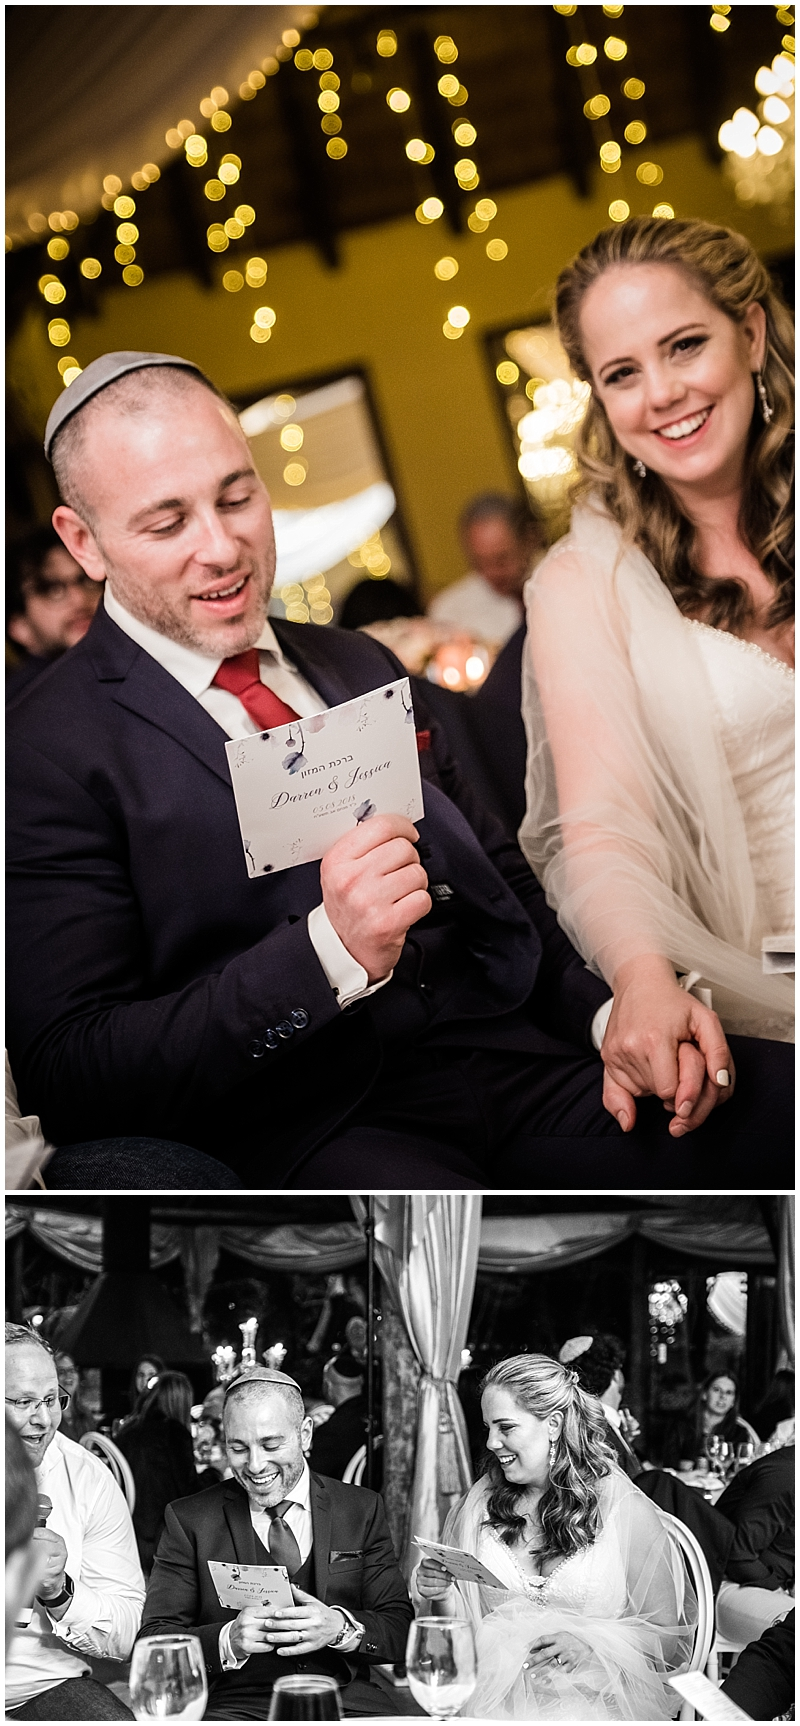 AlexanderSmith-824_AlexanderSmith Best Wedding Photographer.jpg